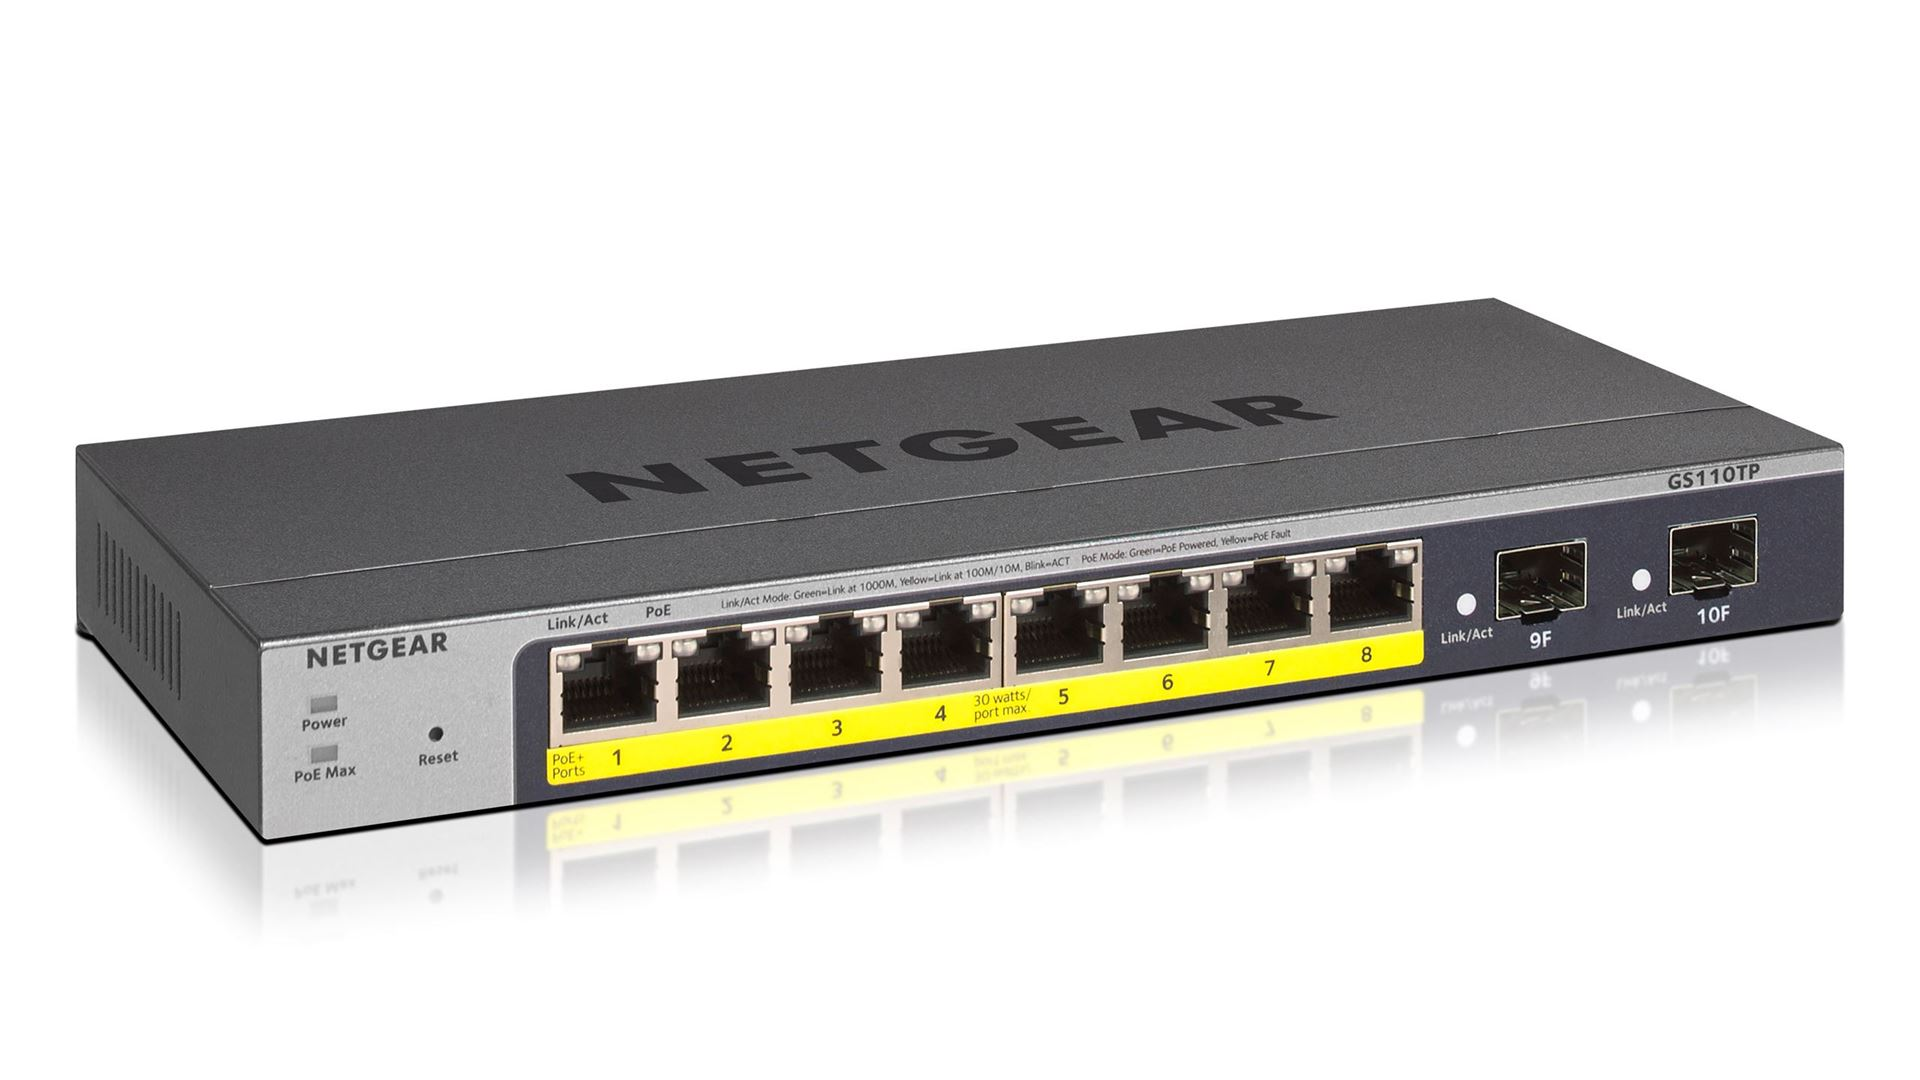 NETGEAR 8-port Gigabit PoE+ Ethernet Smart Managed Pro  Switch with 2 SFP Ports (GS110TPv3)